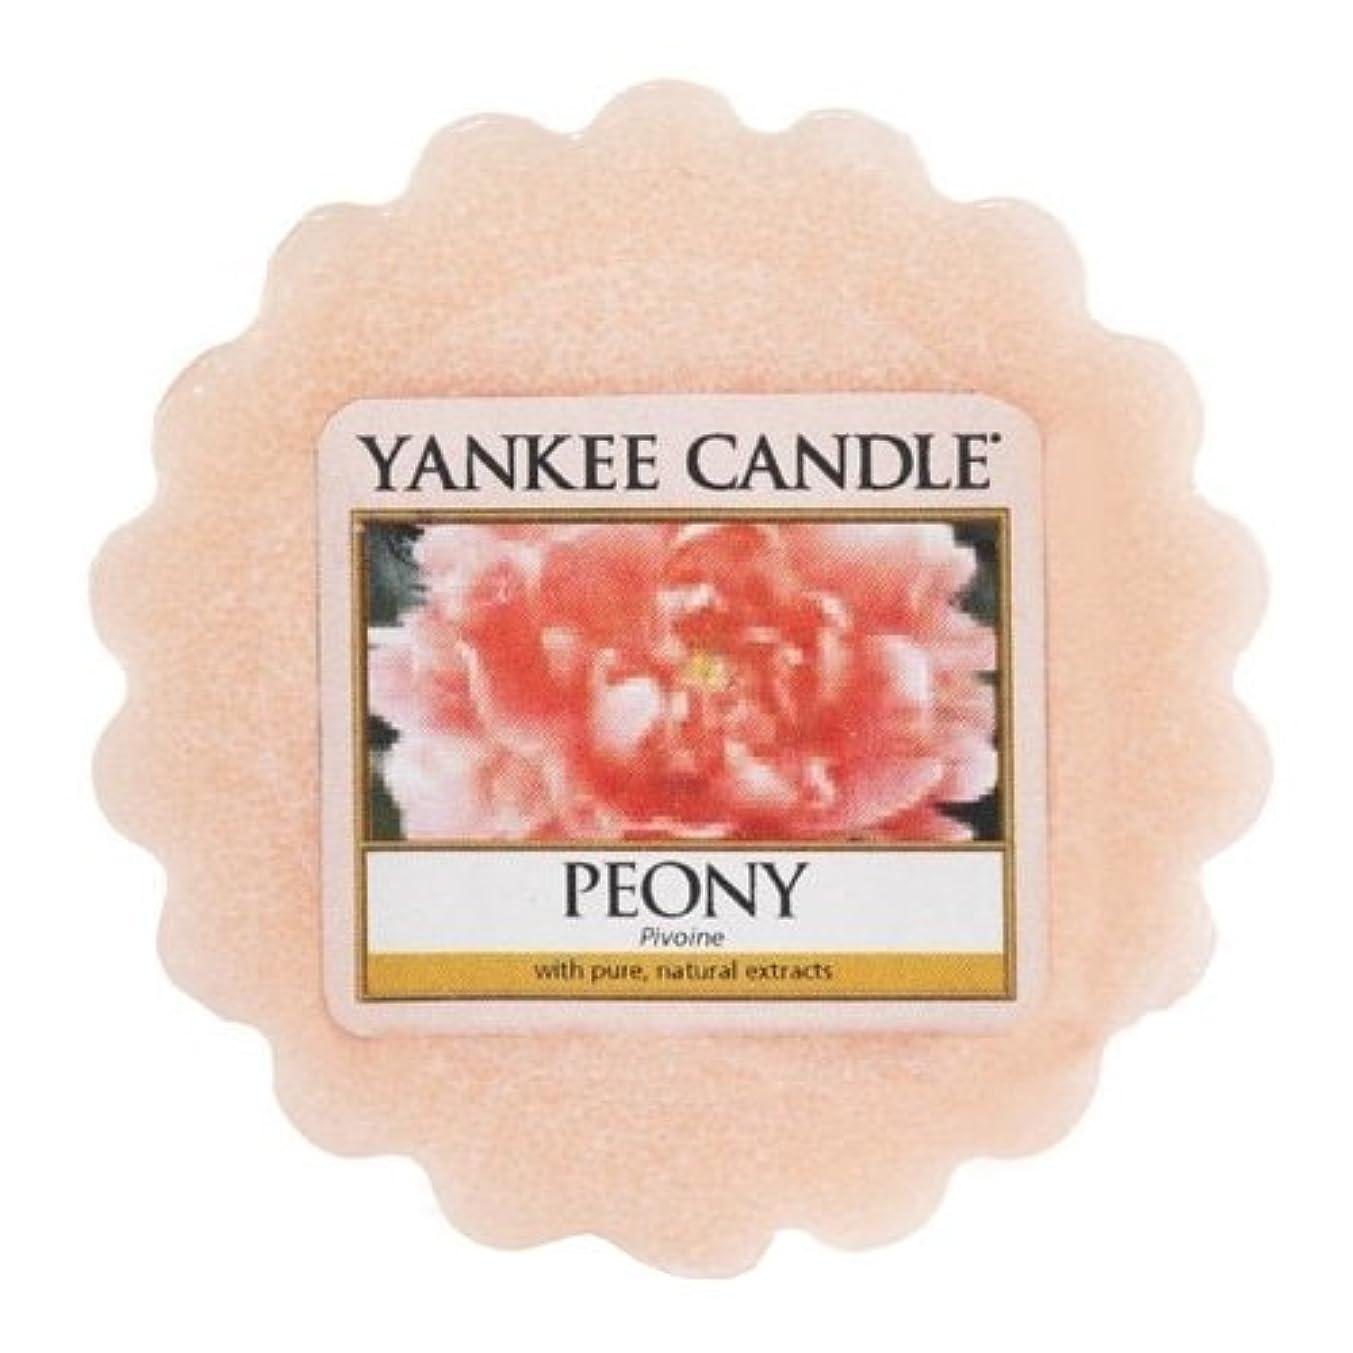 Yankee Candle 22 g Peony Wax Melt (Tart), Pink, l x 5.6cm w x 1.5cm h